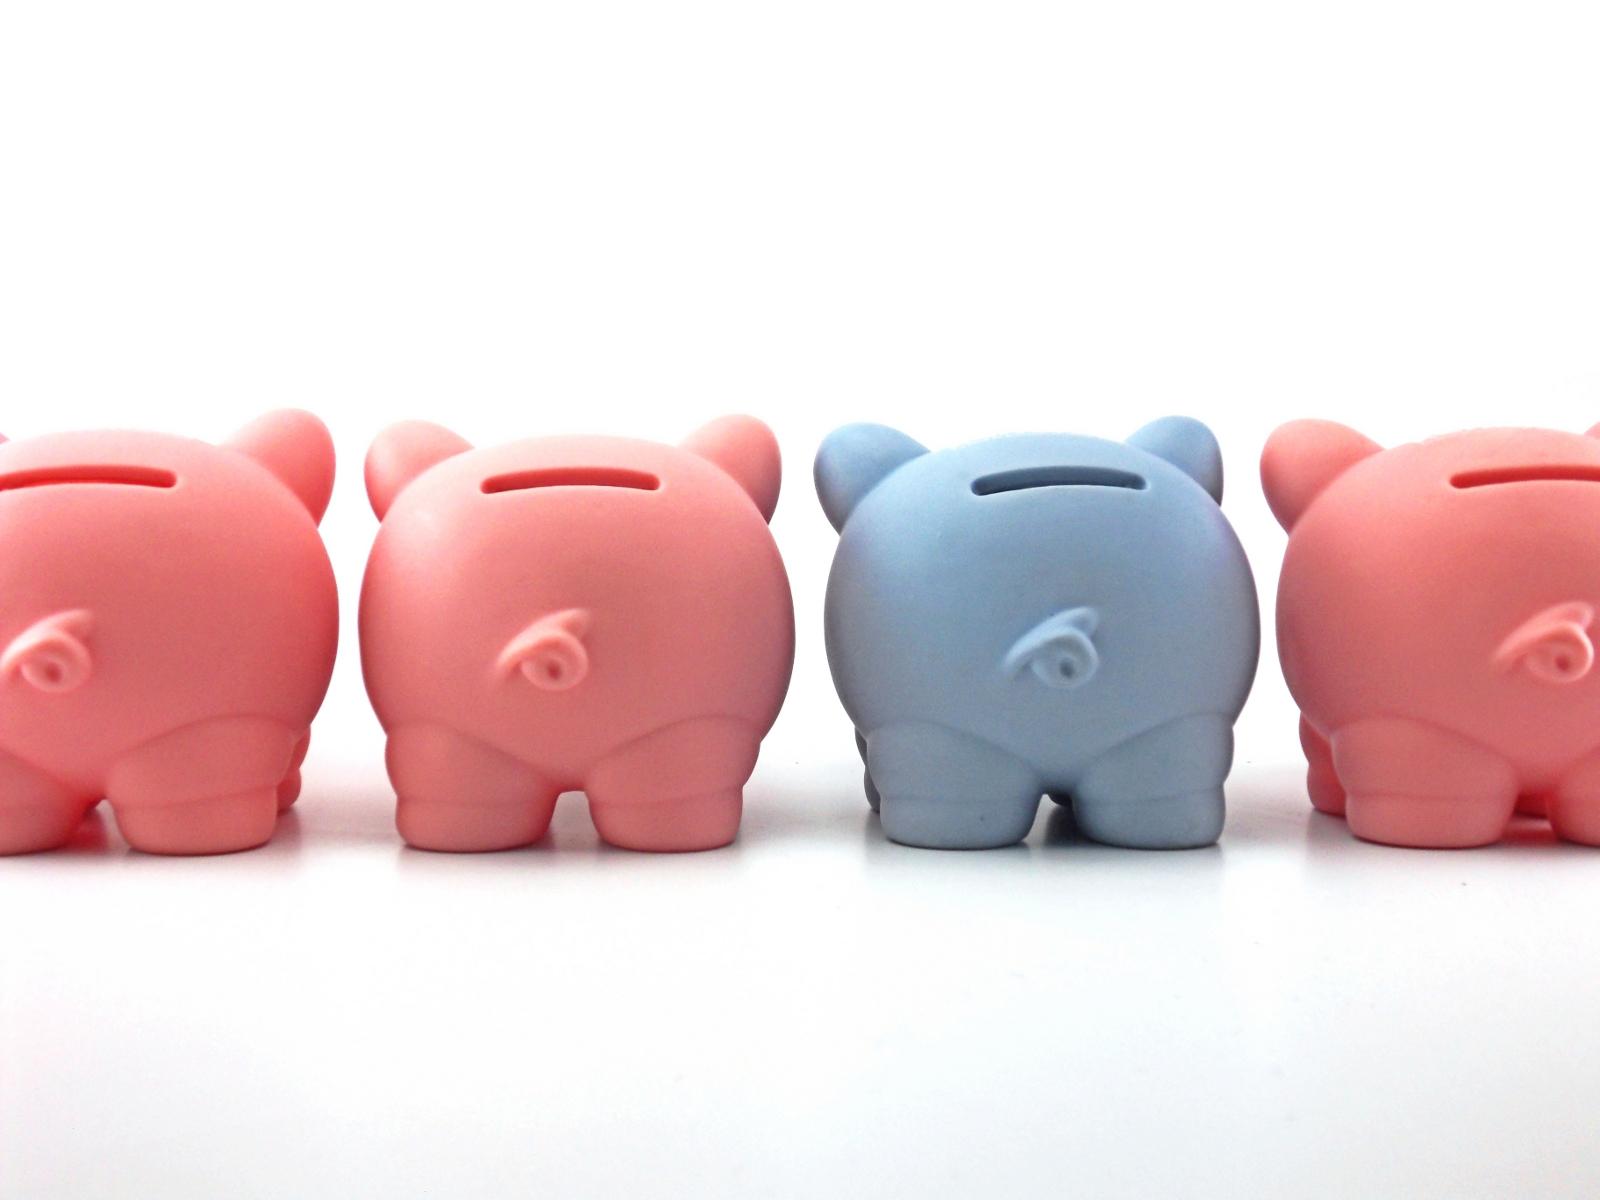 Piggy Bank, 3d, Savings, Nobody, Object, HQ Photo